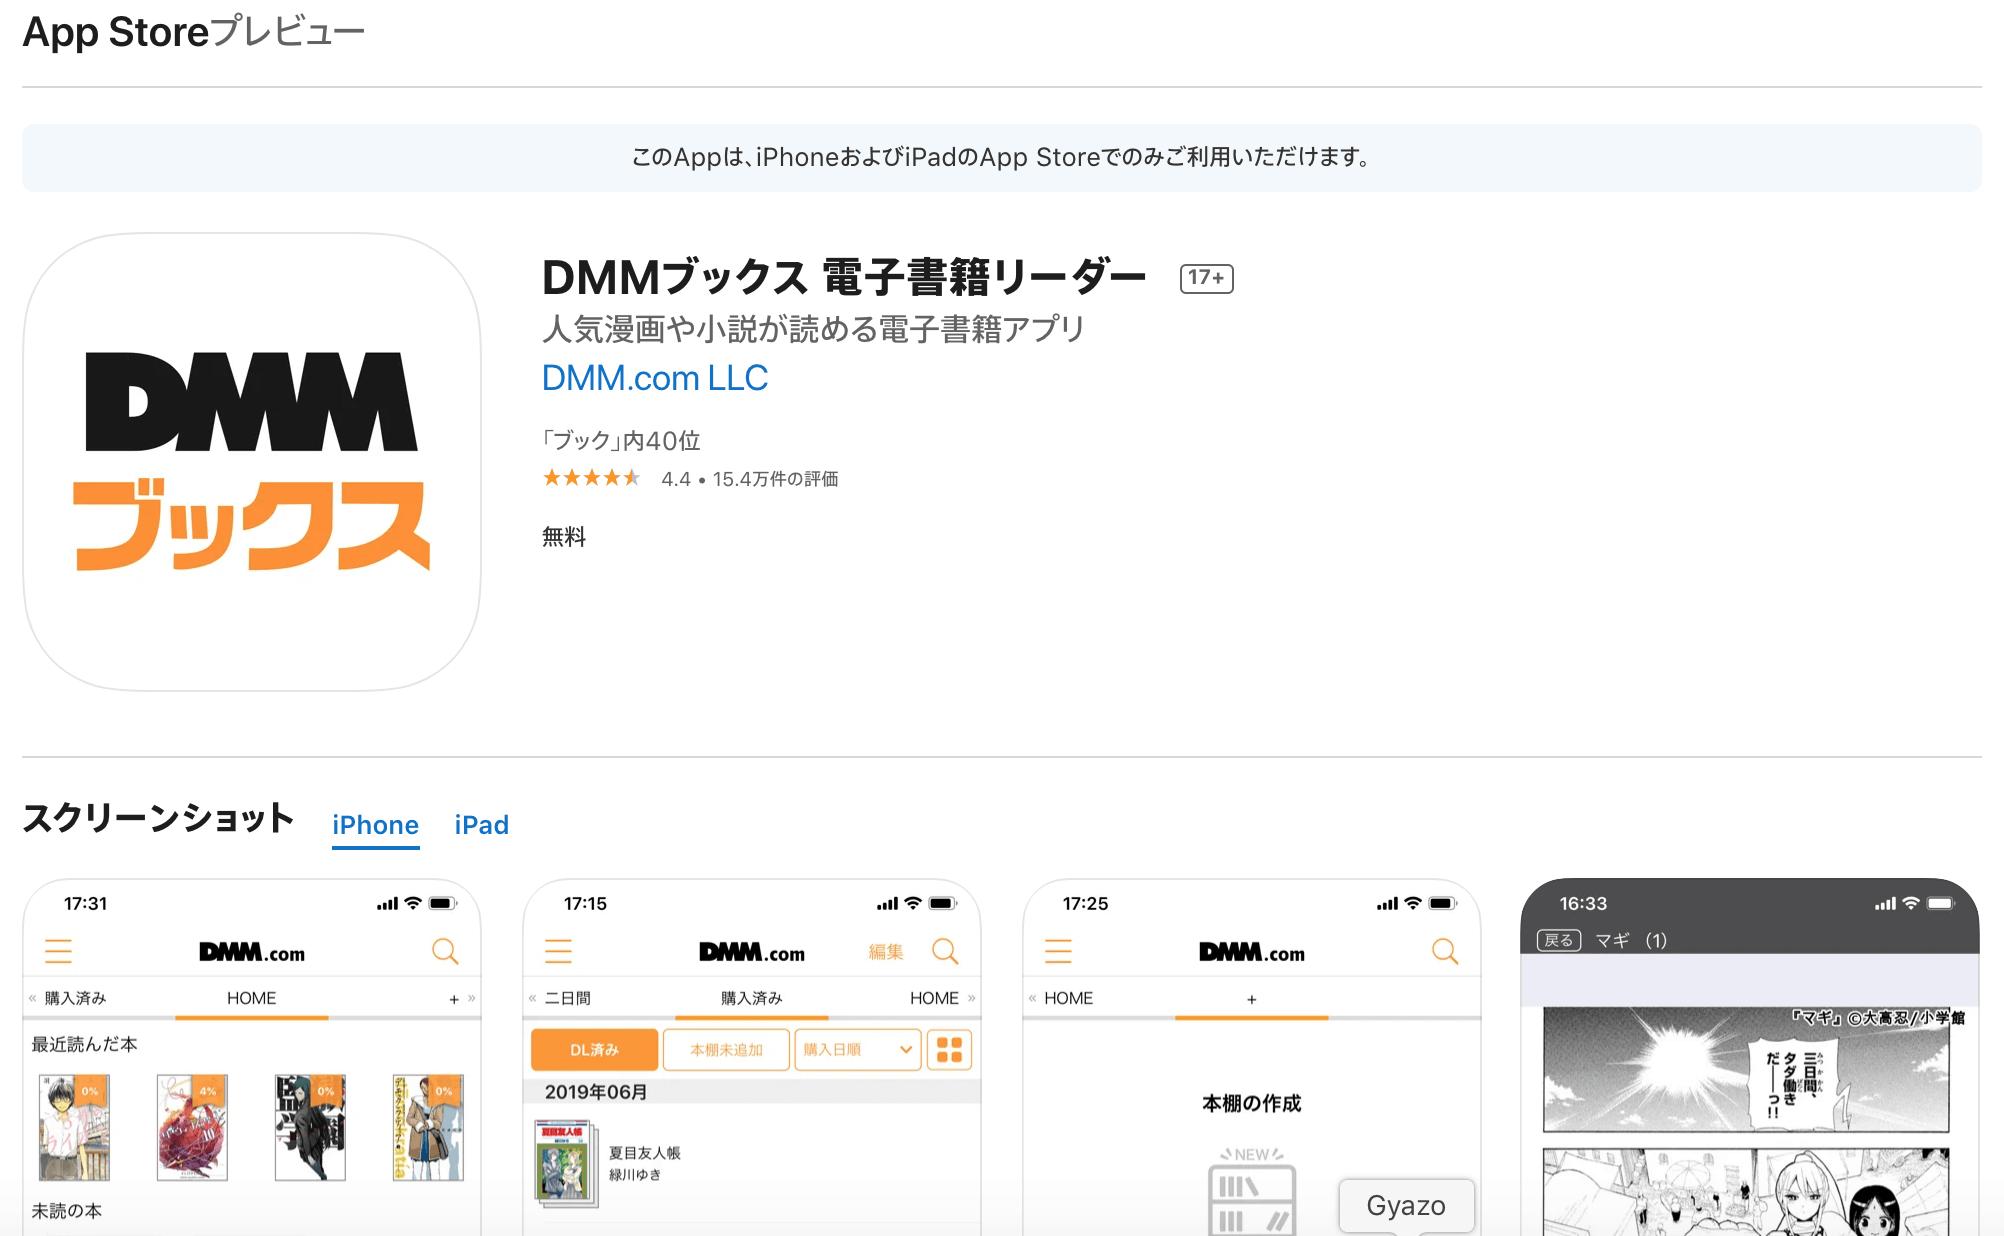 DMM電子書籍のアプリはある?使いやすい?